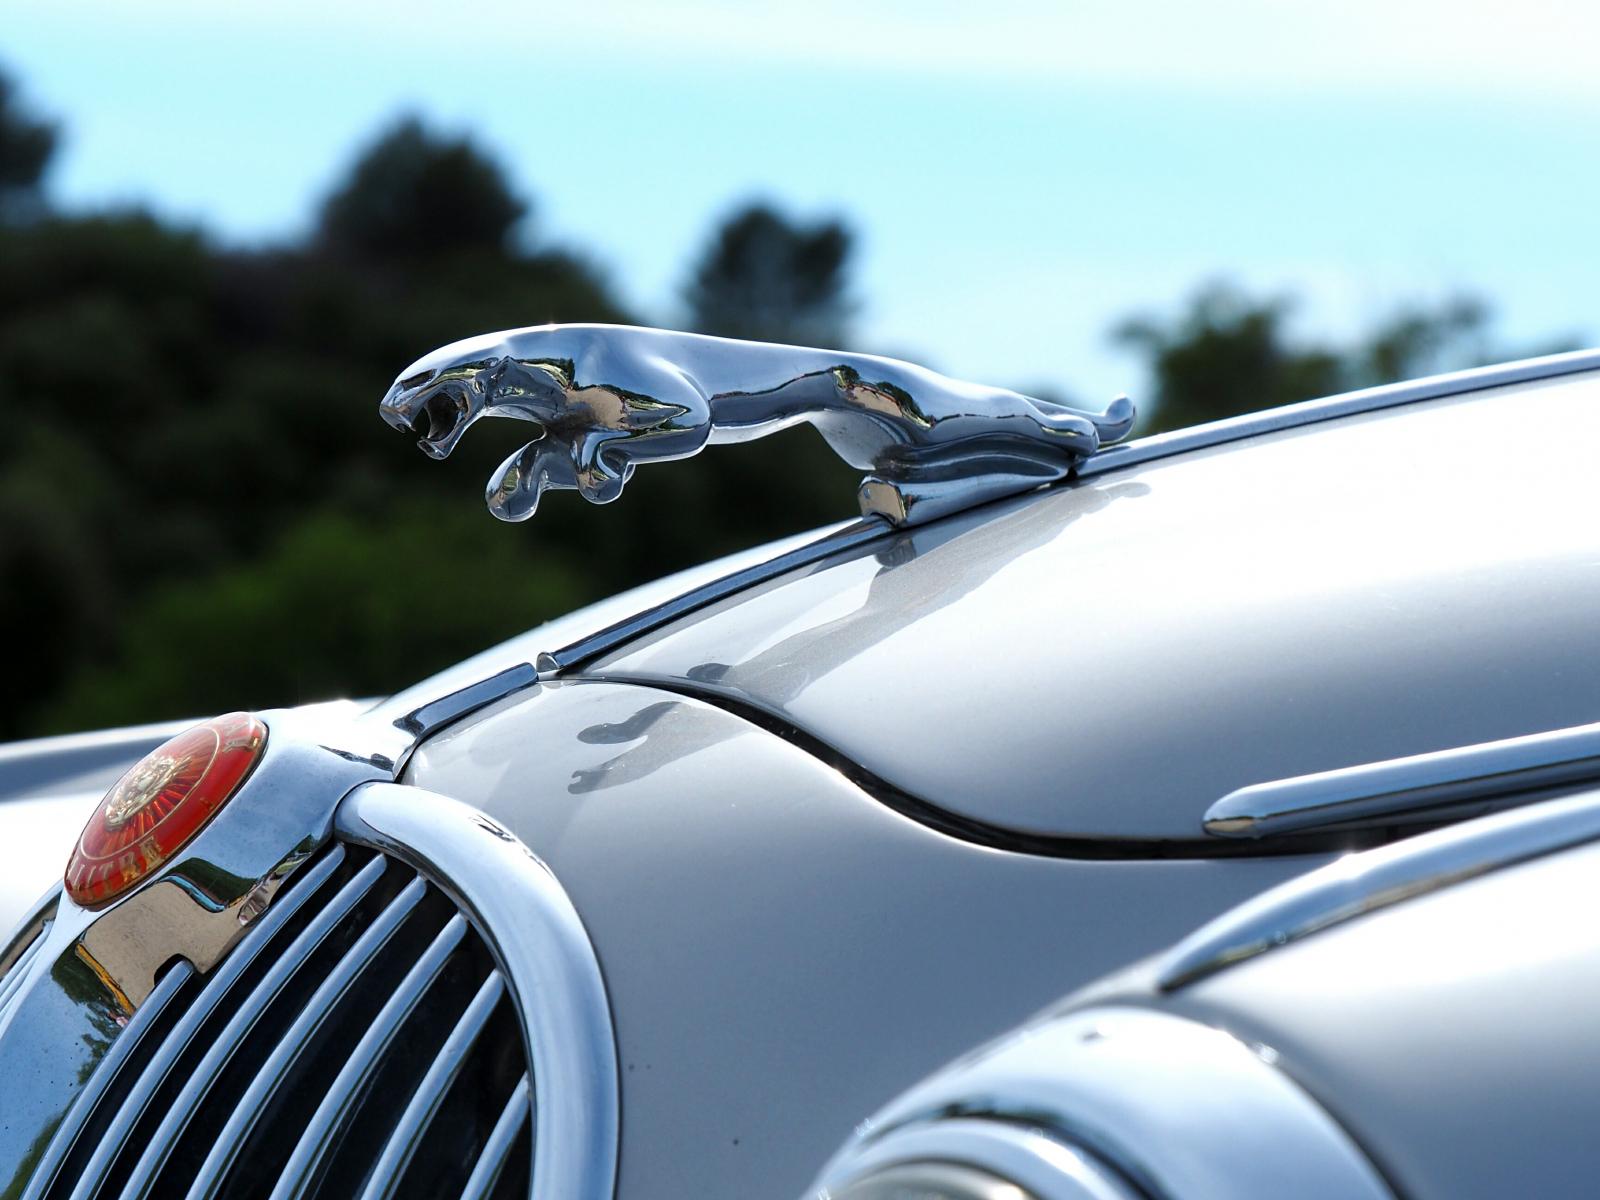 Download 1600x1200 Wallpaper Jaguar Car Logo Car Standard 4 3